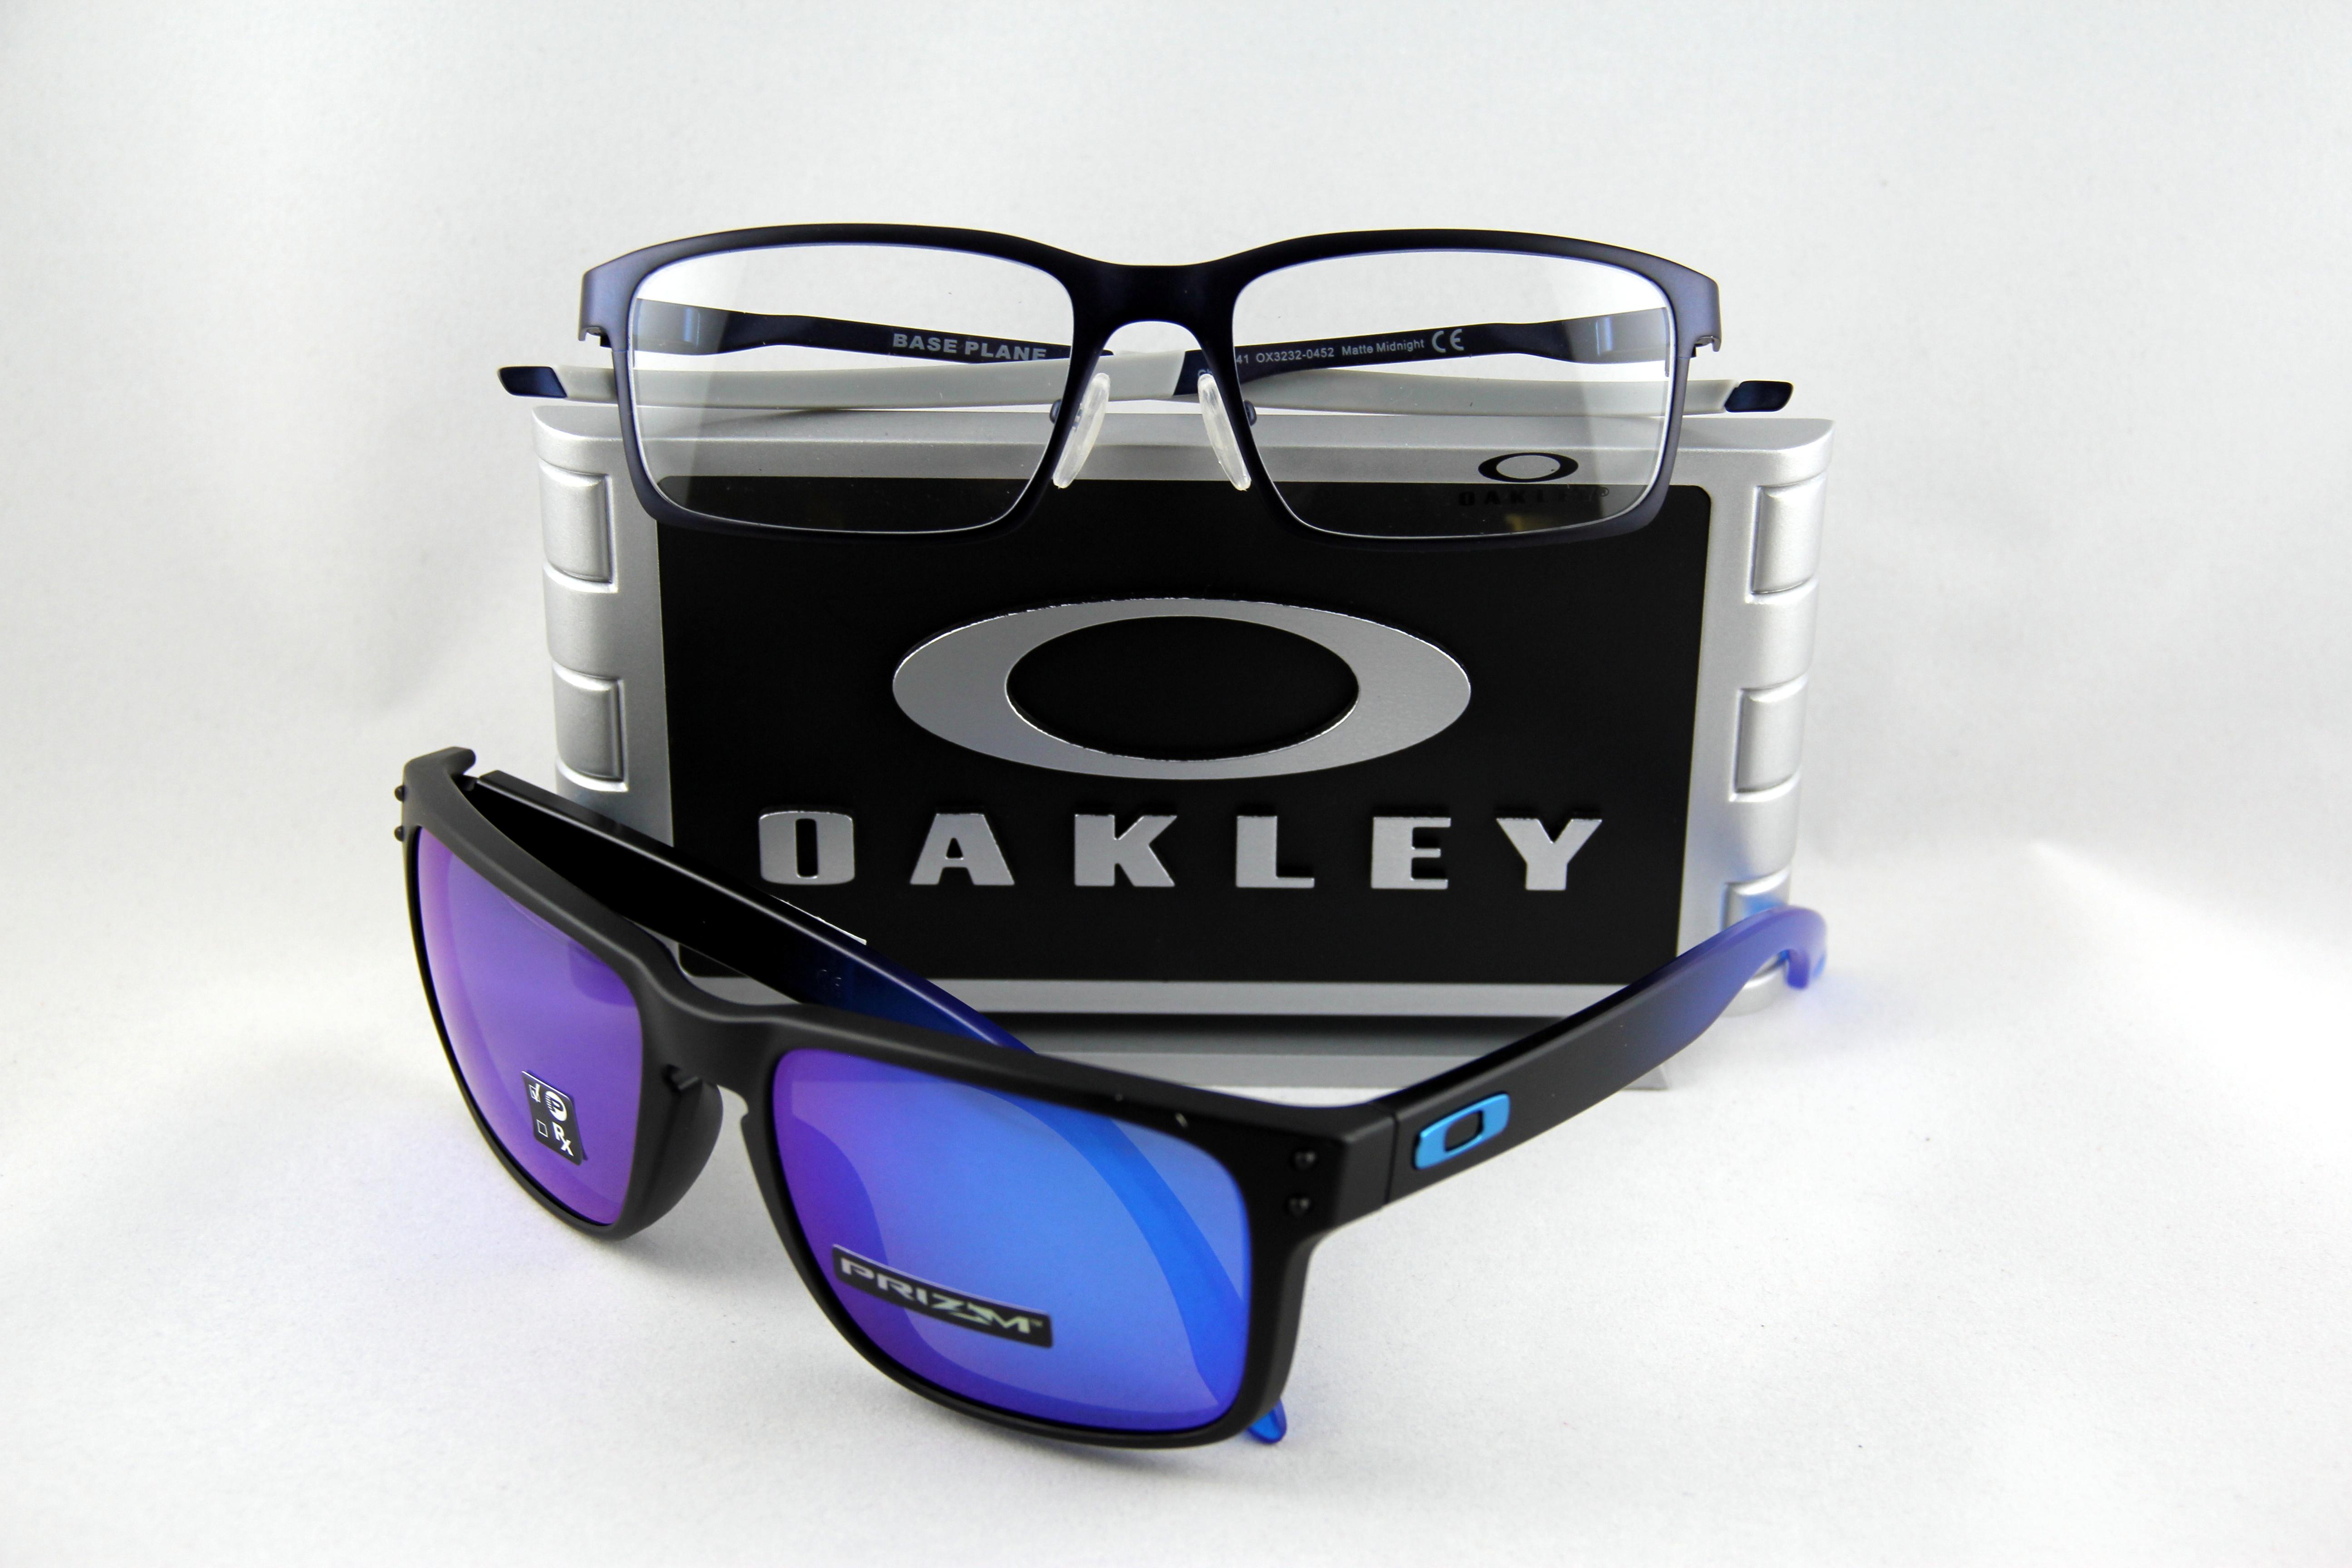 Oakley-2-edited